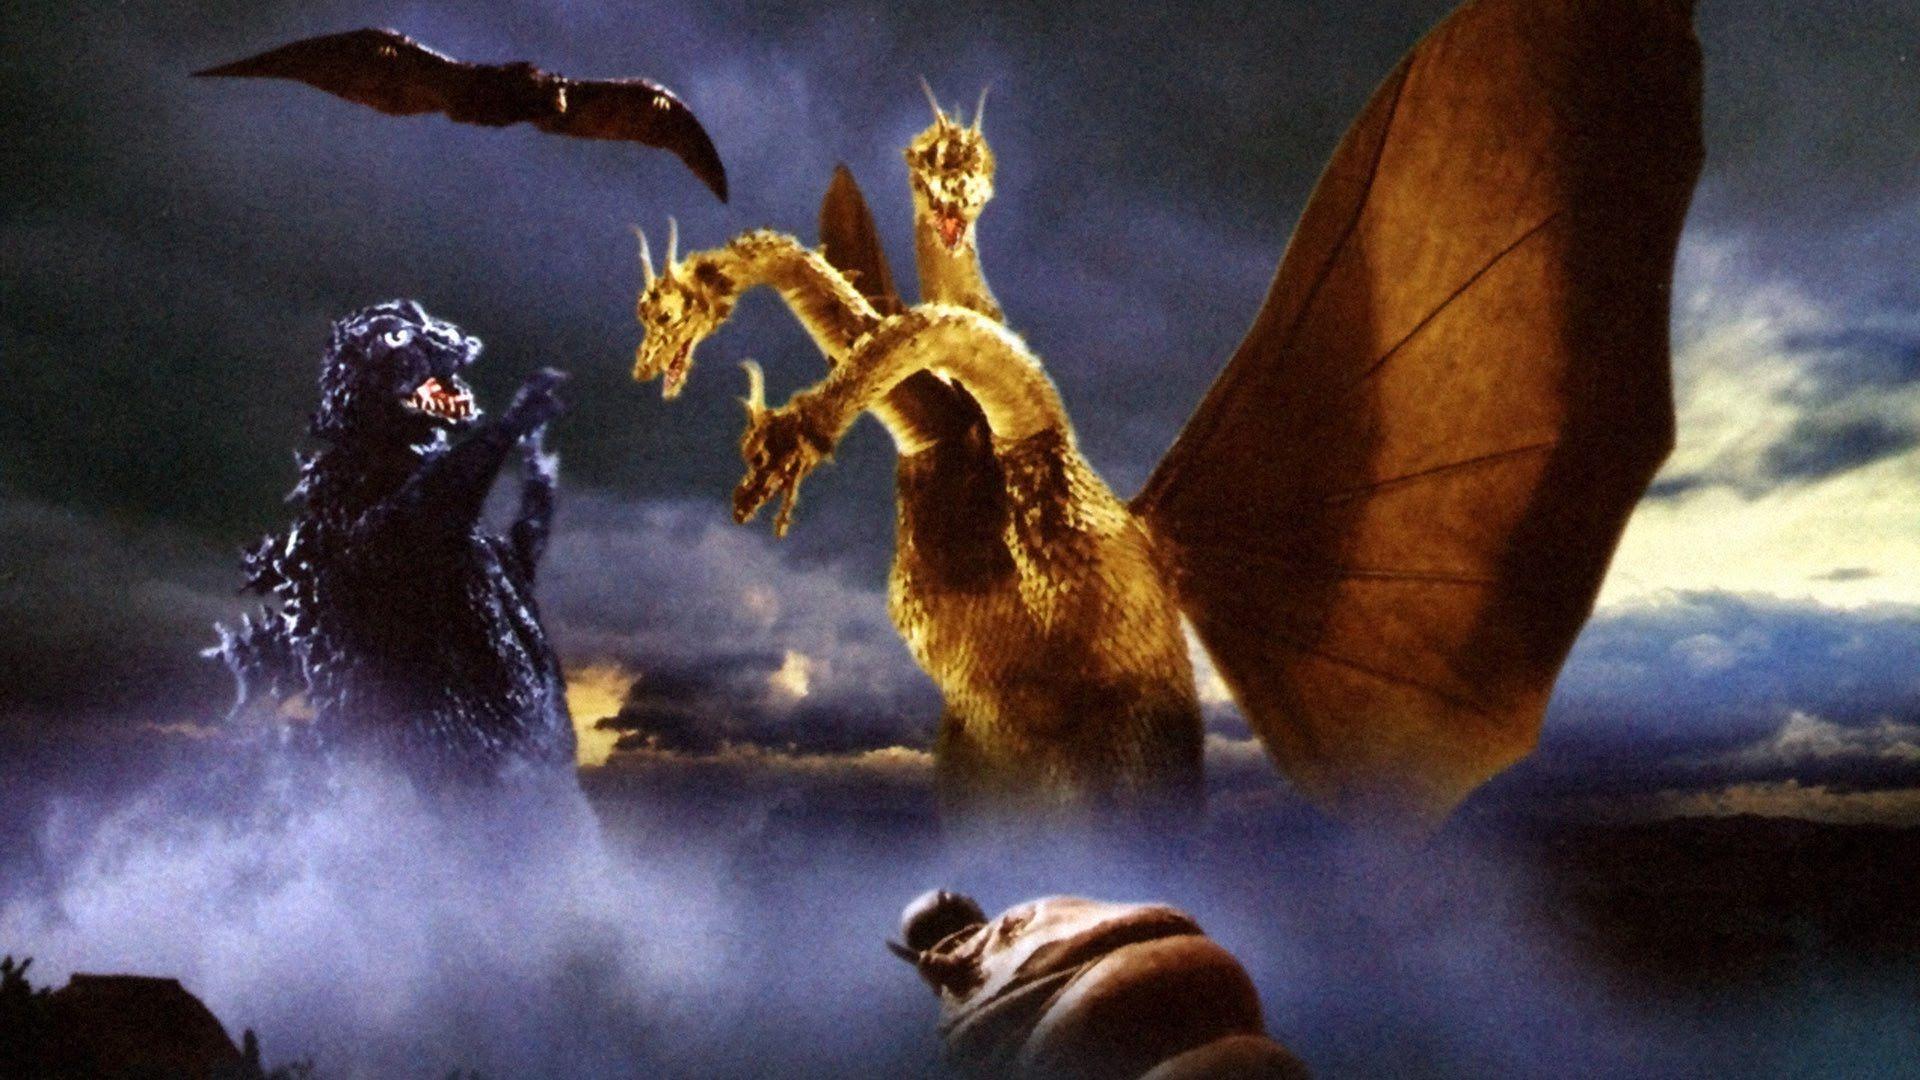 The Original Godzilla Movie Franchise Timeline Is Confusing | CBR